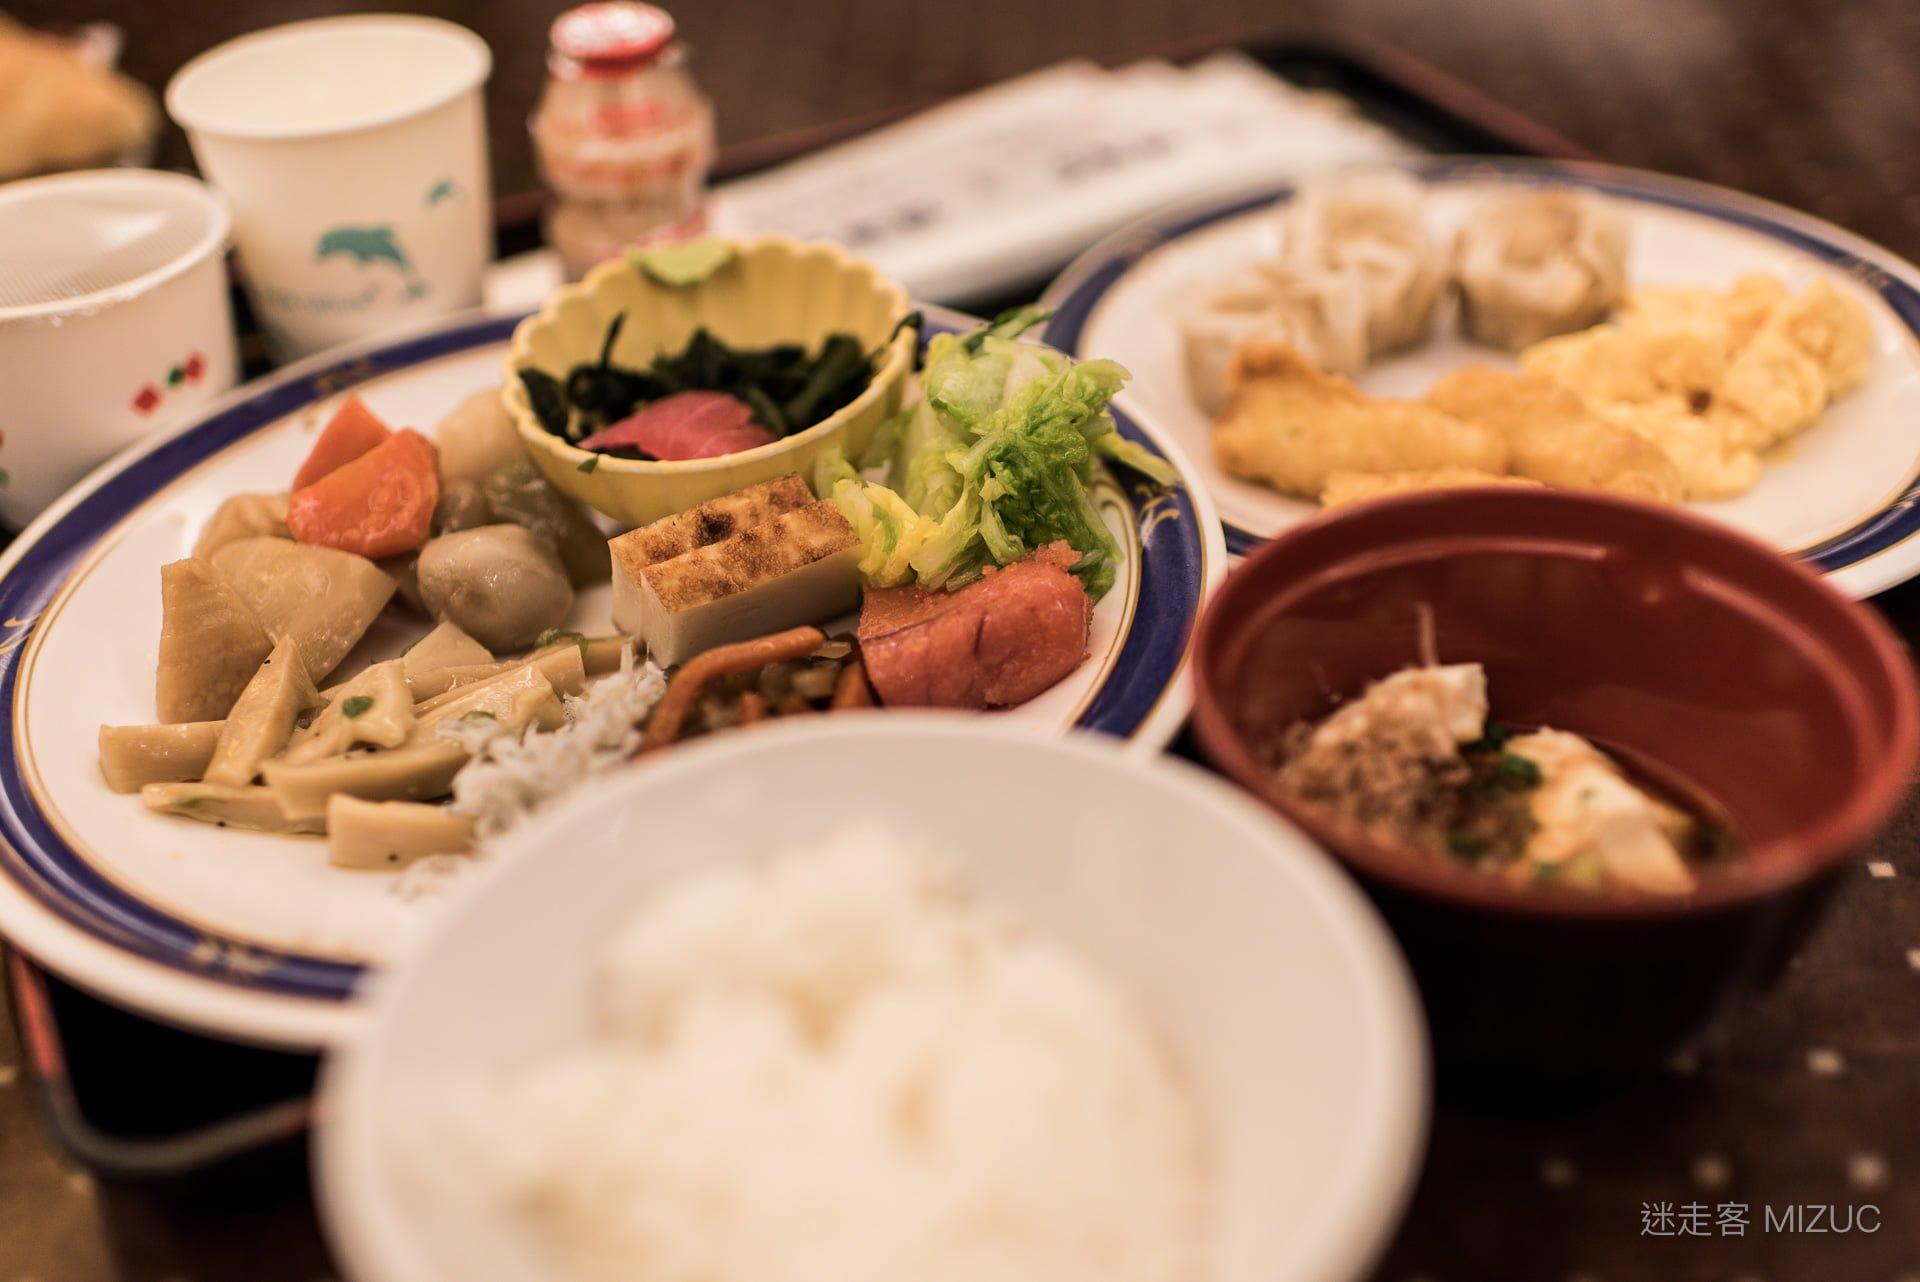 201711 Ibaraki Tochigi Gunma Japan Travel By RentalCar 50 日本自駕旅遊/北關東三縣「茨城、櫪木、群馬」秋天美食、溫泉與瀑布秘境百景(精選照片分享)